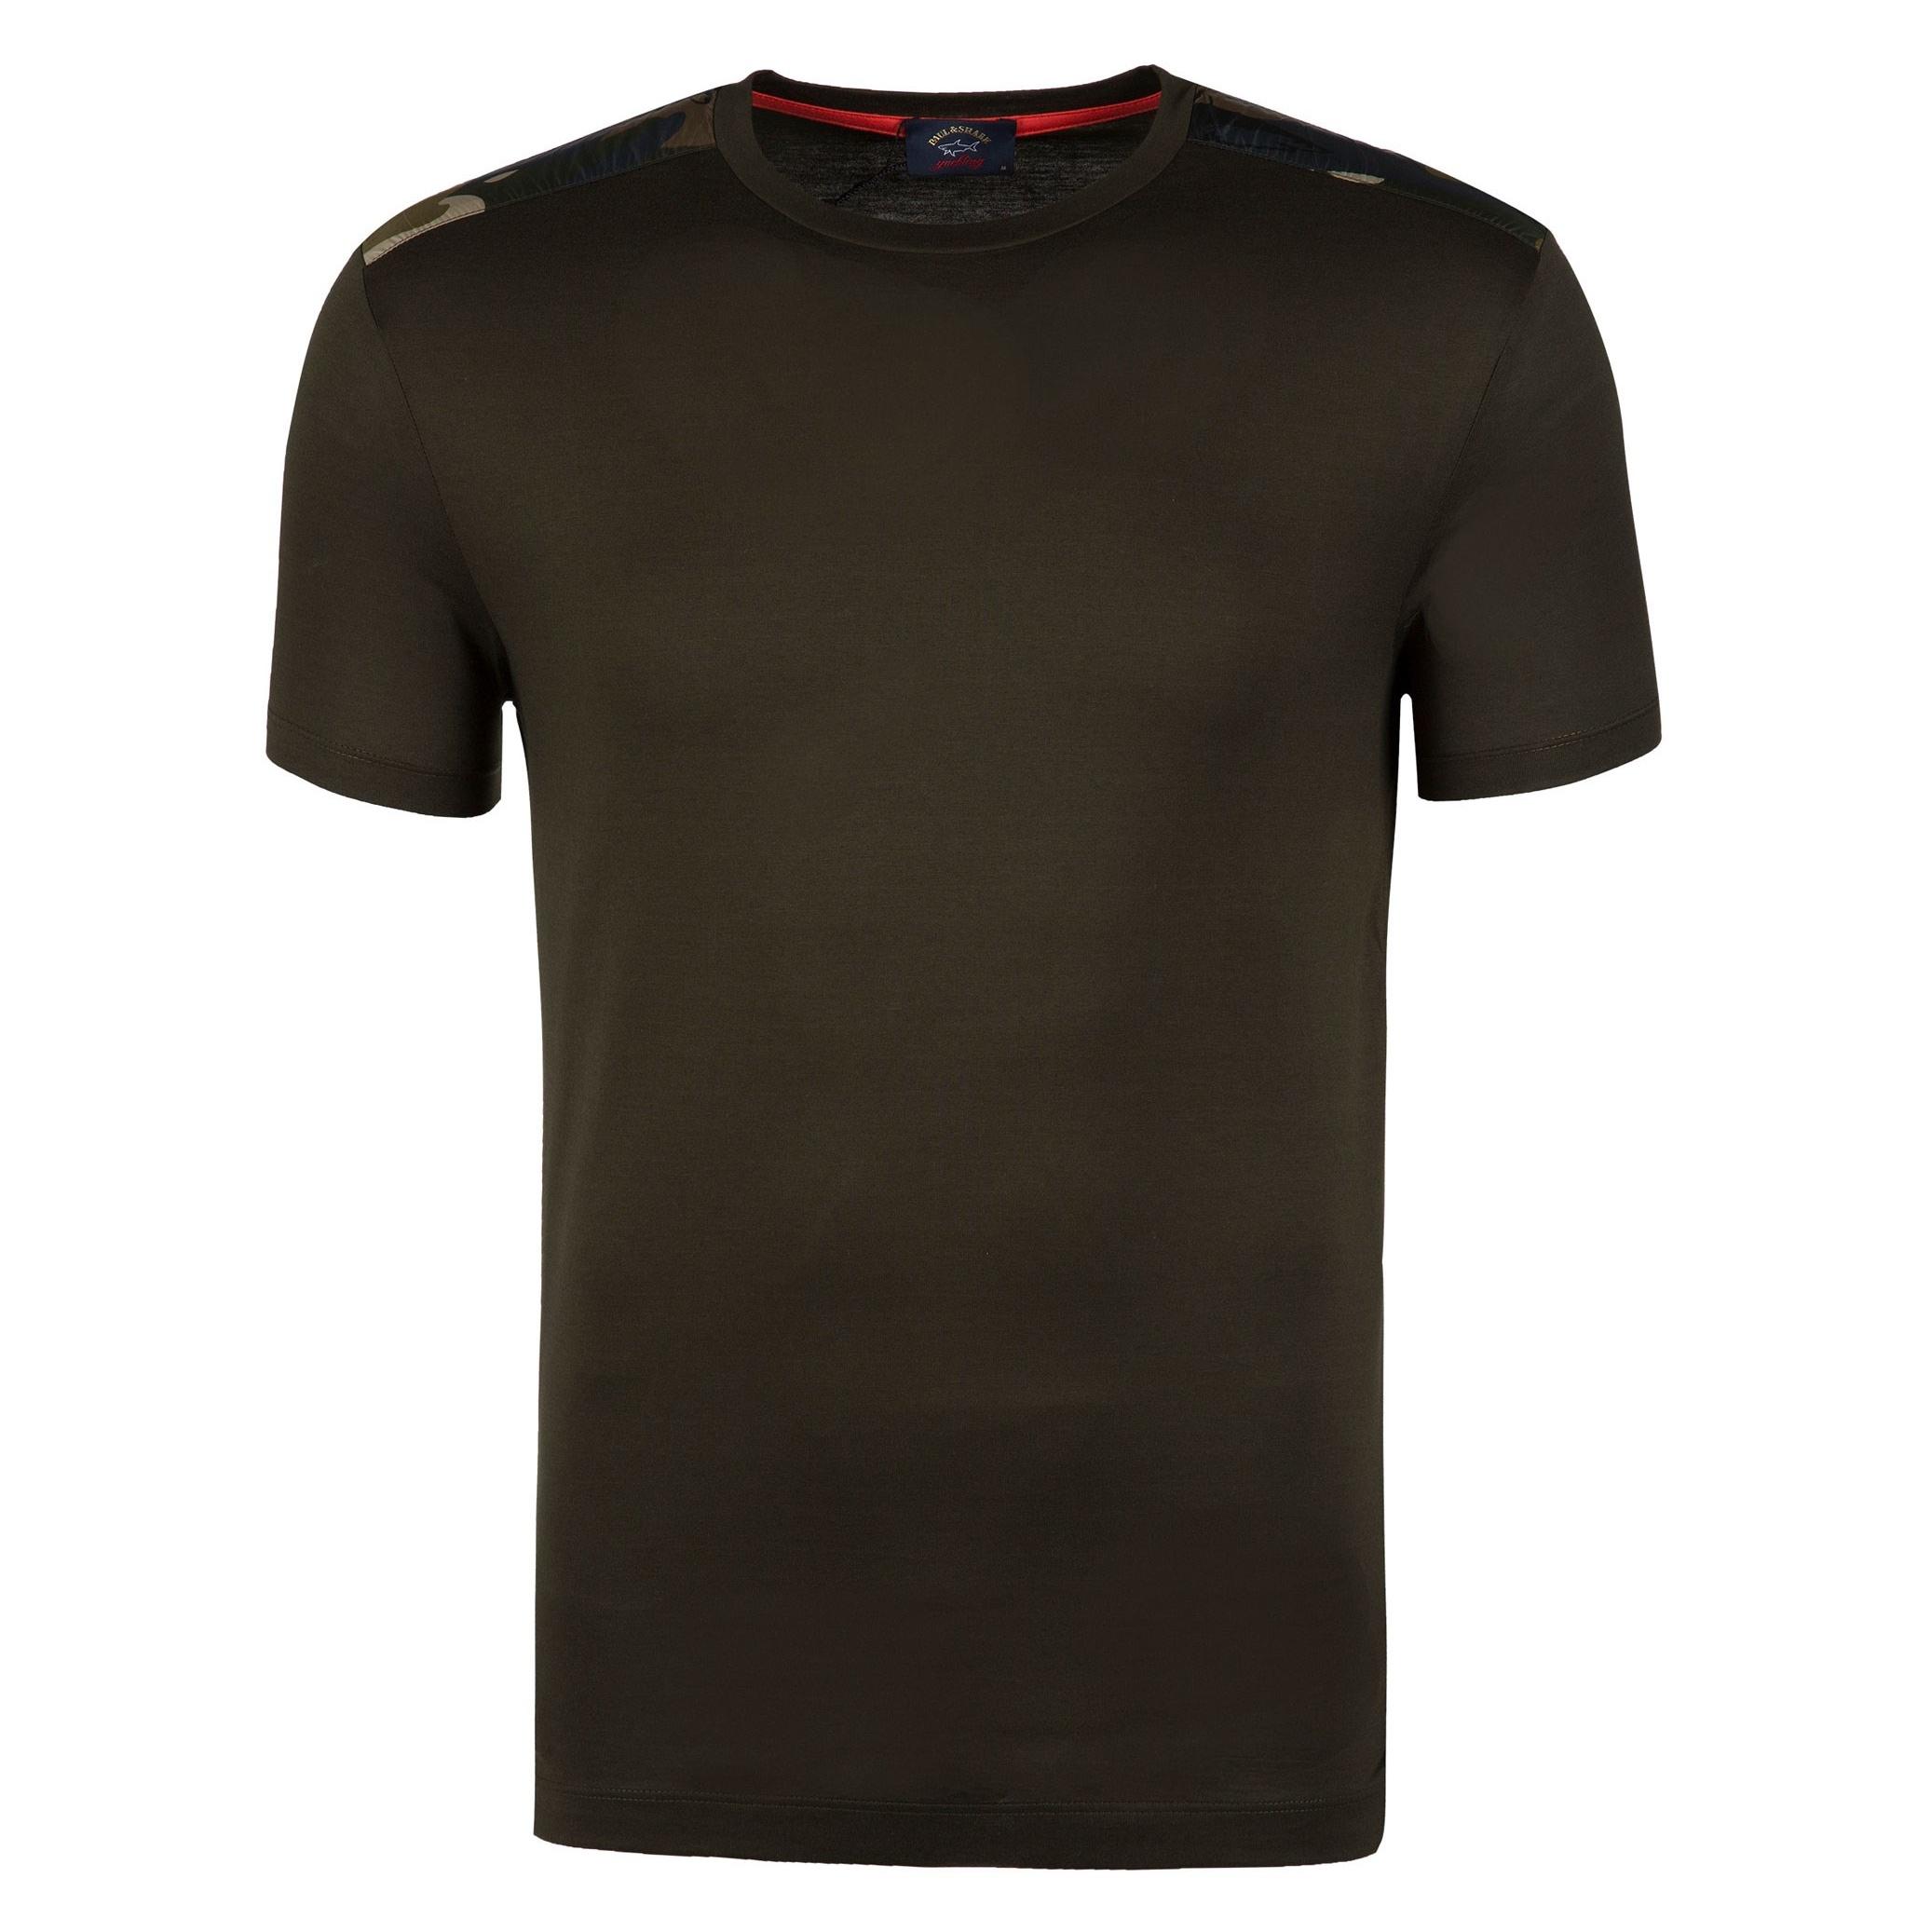 تی شرت نخی یقه گرد مردانه - پاول اند شارک - زيتوني تيره - 1